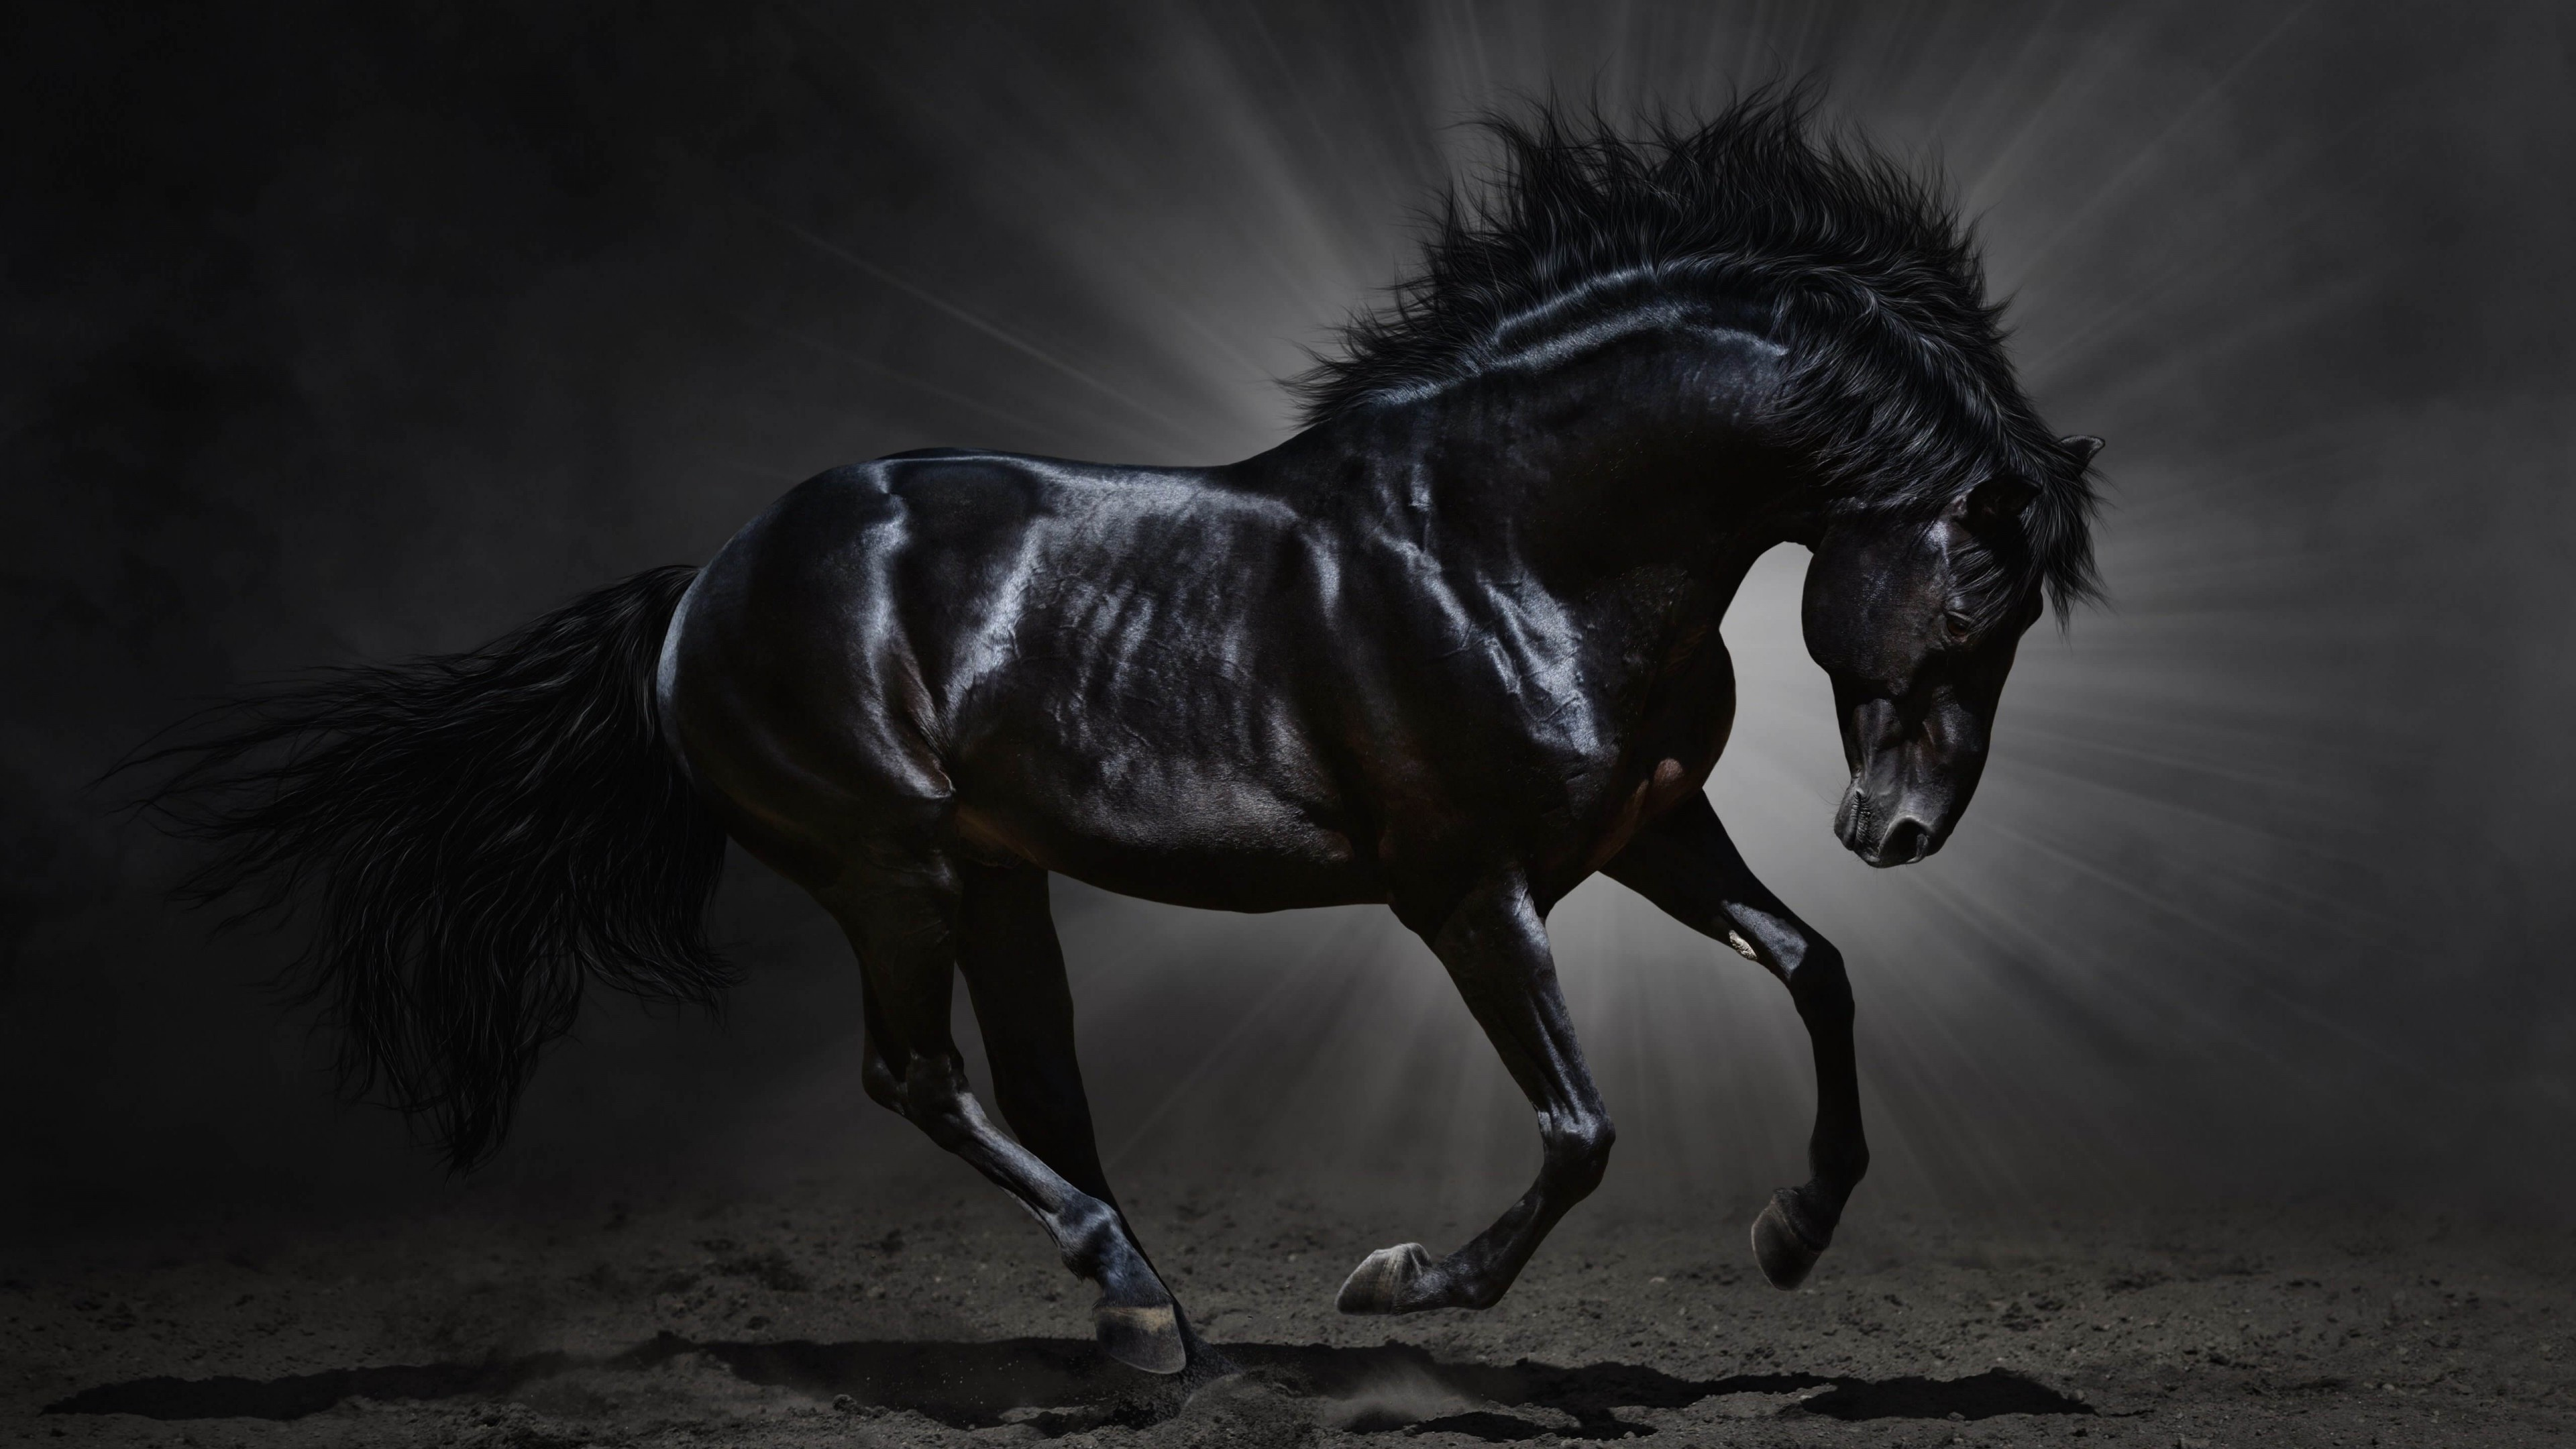 Black Horse Desktop Wallpaper | Download Dark Horse HD wallpaper for 4K  3840 x 2160 –